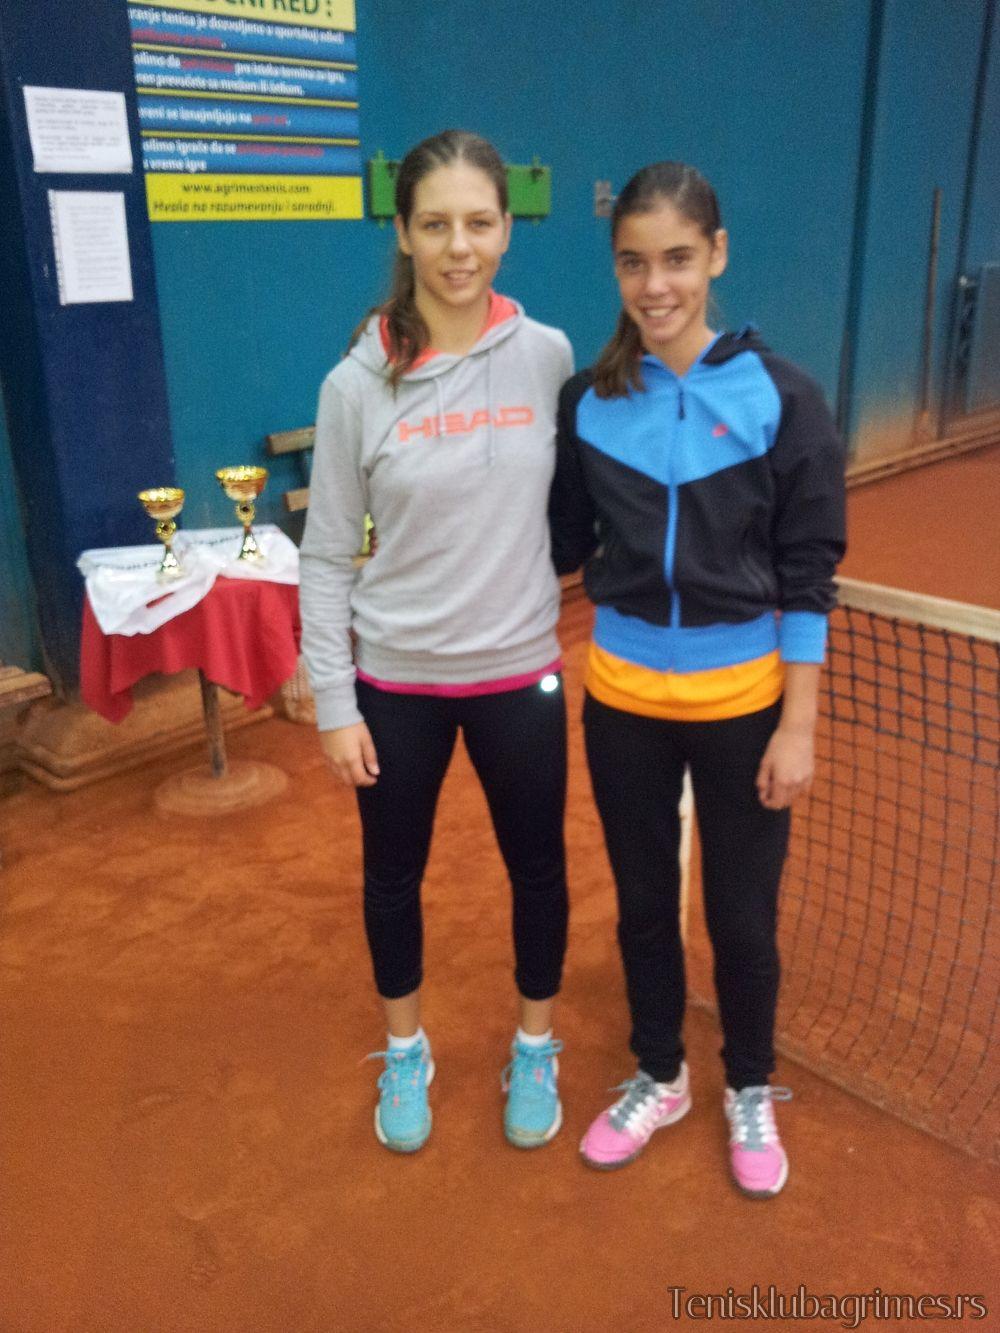 Turnir za devojke do 18 godina